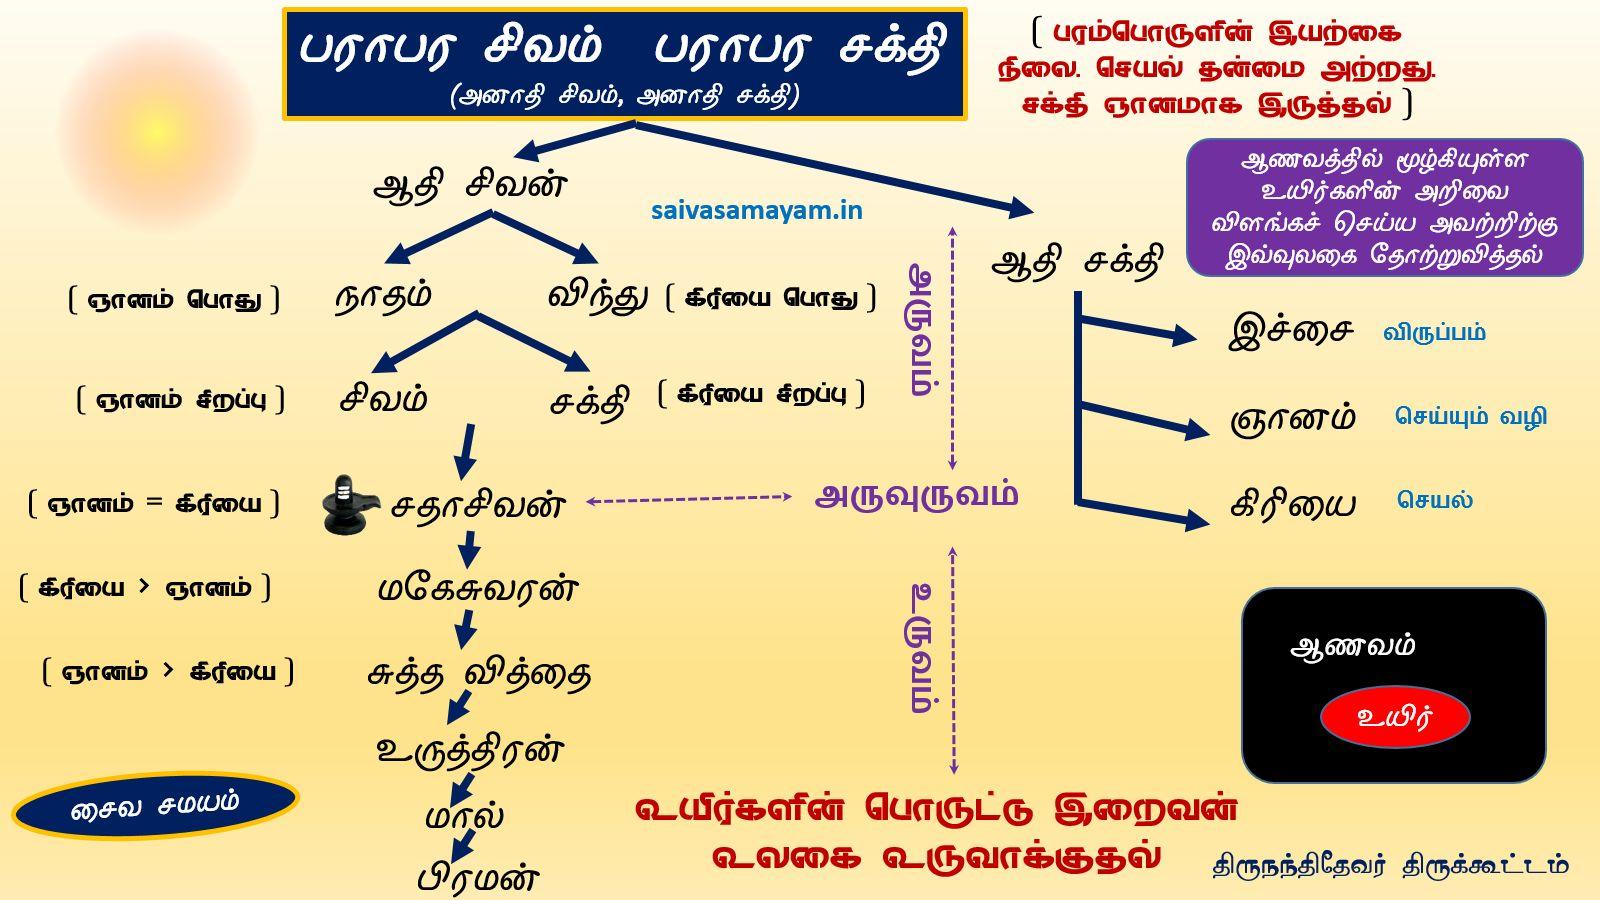 http://www.saivasamayam.in/wp-content/uploads/2017/04/Nutpam3pic3.jpg